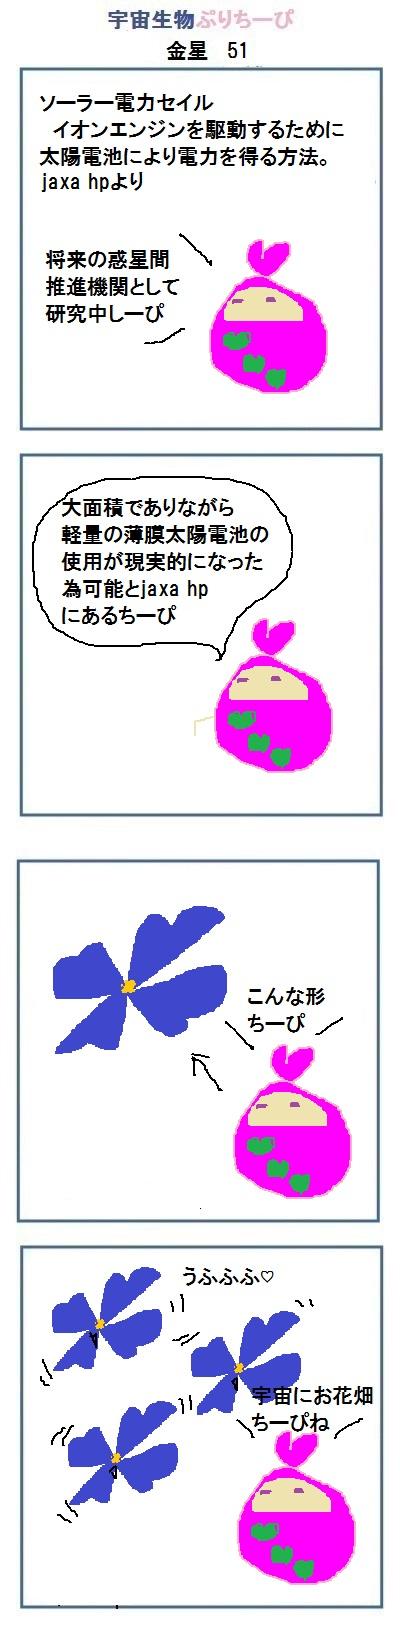 160724_kinsei51.jpg